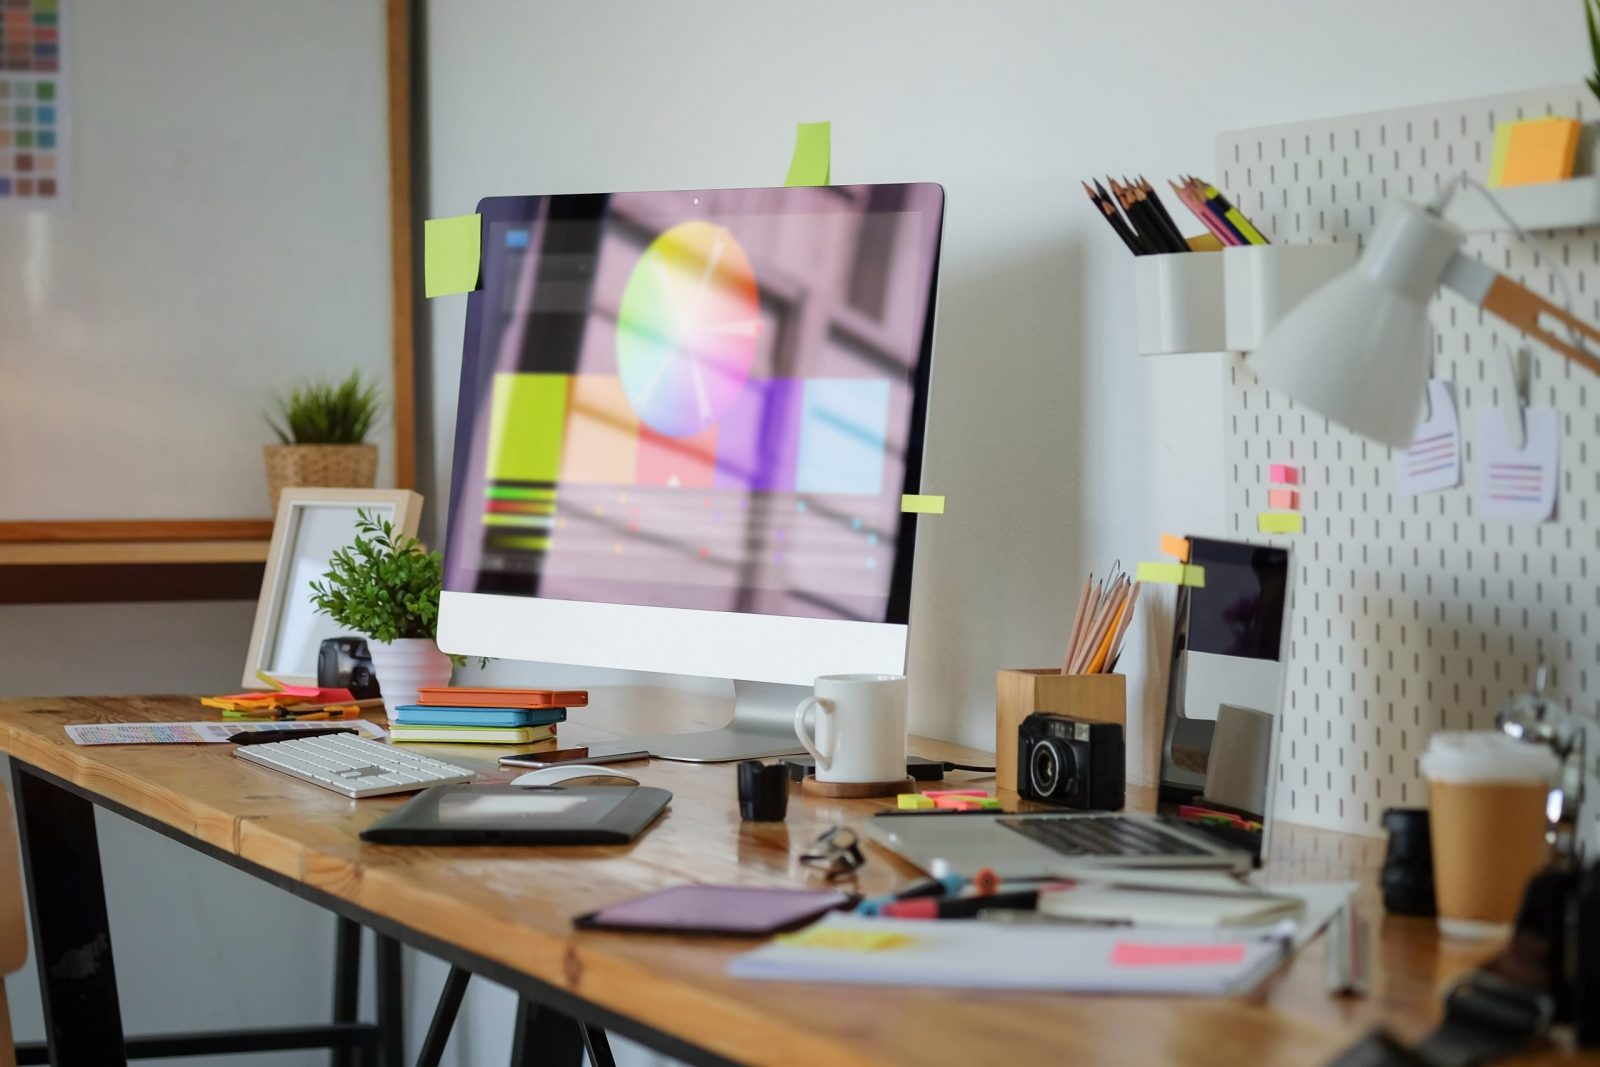 designers desk covered notes aalofts design scaled